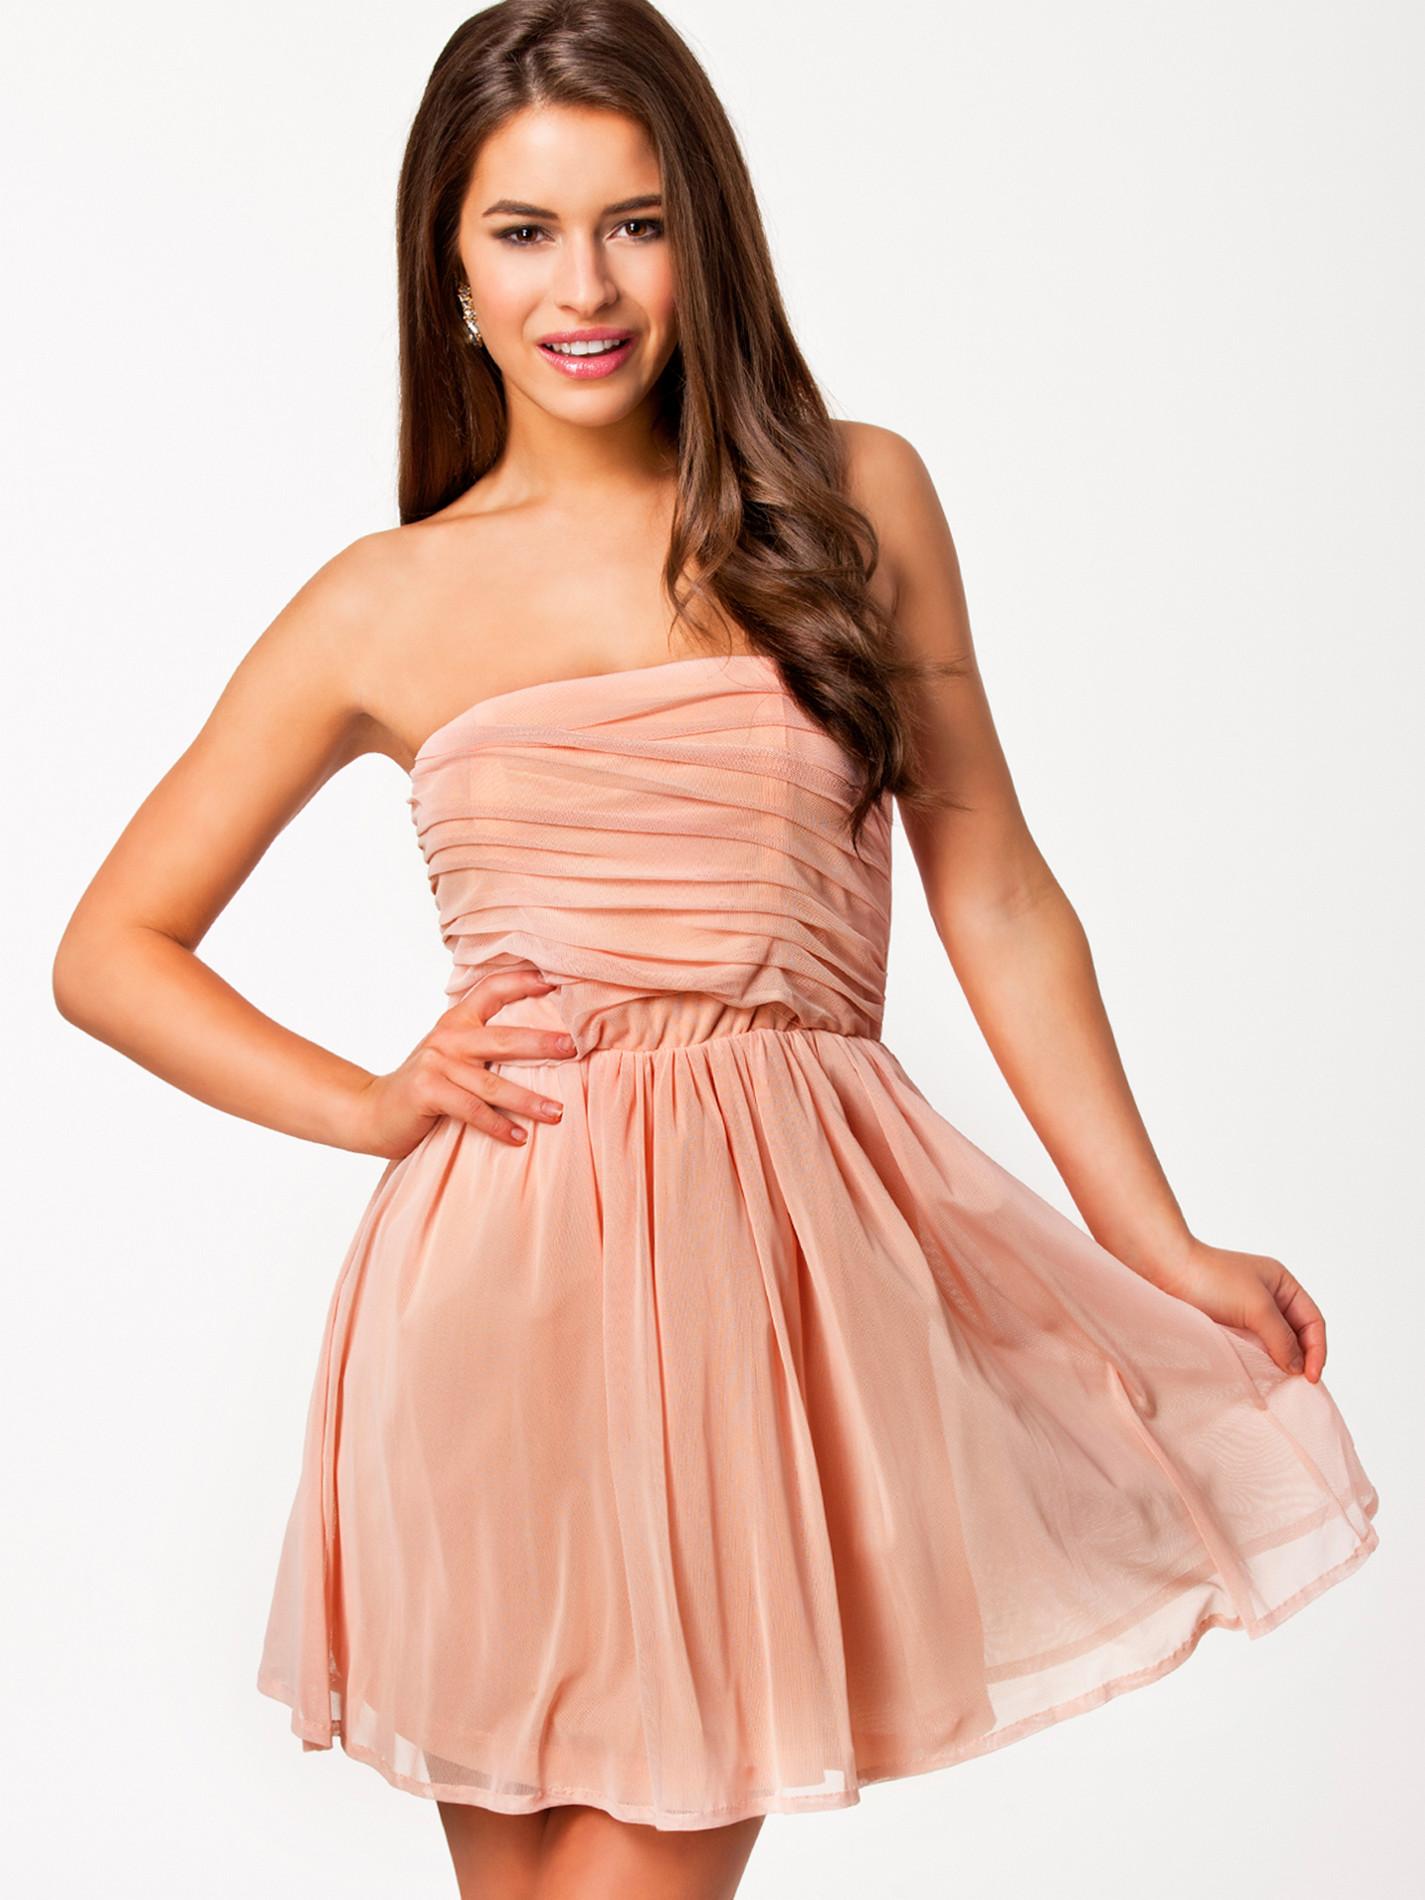 Robe de soirée Nelly.com - Mimosa Dress Jeane Blush Abricot - Ventes ... 09671848ff0